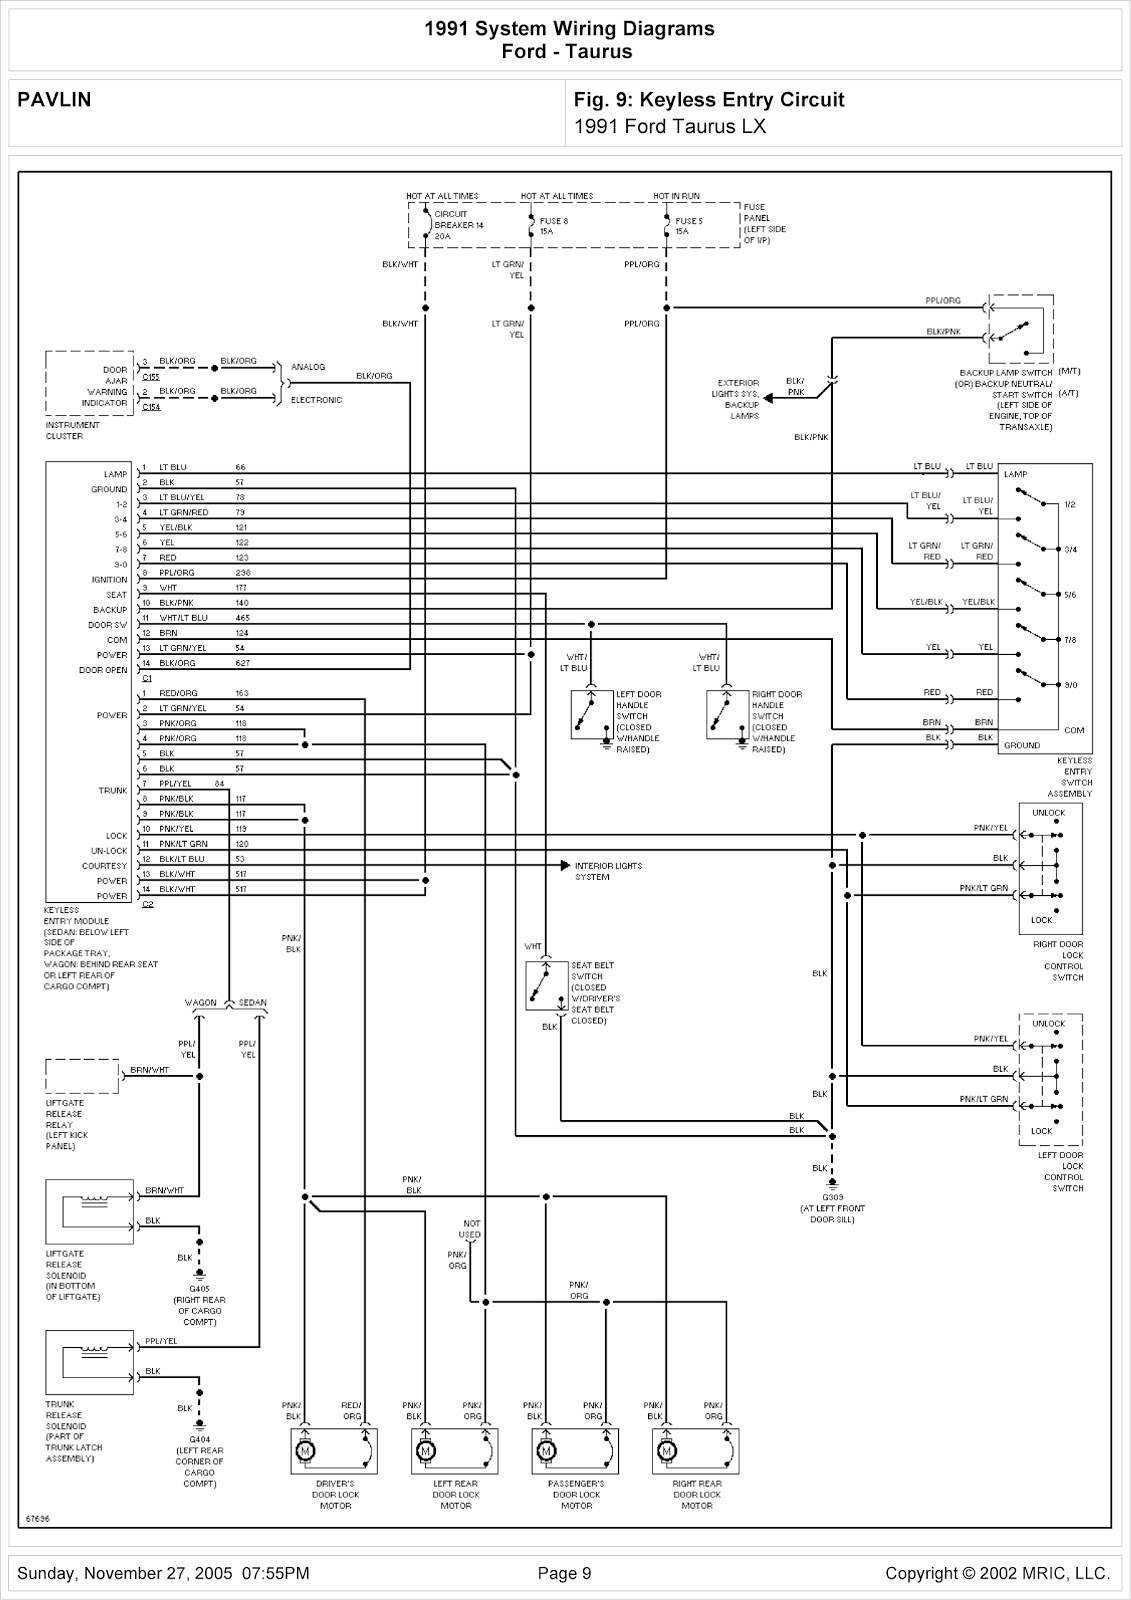 2010 Ford Taurus Wiring Diagram Full Hd Version Wiring